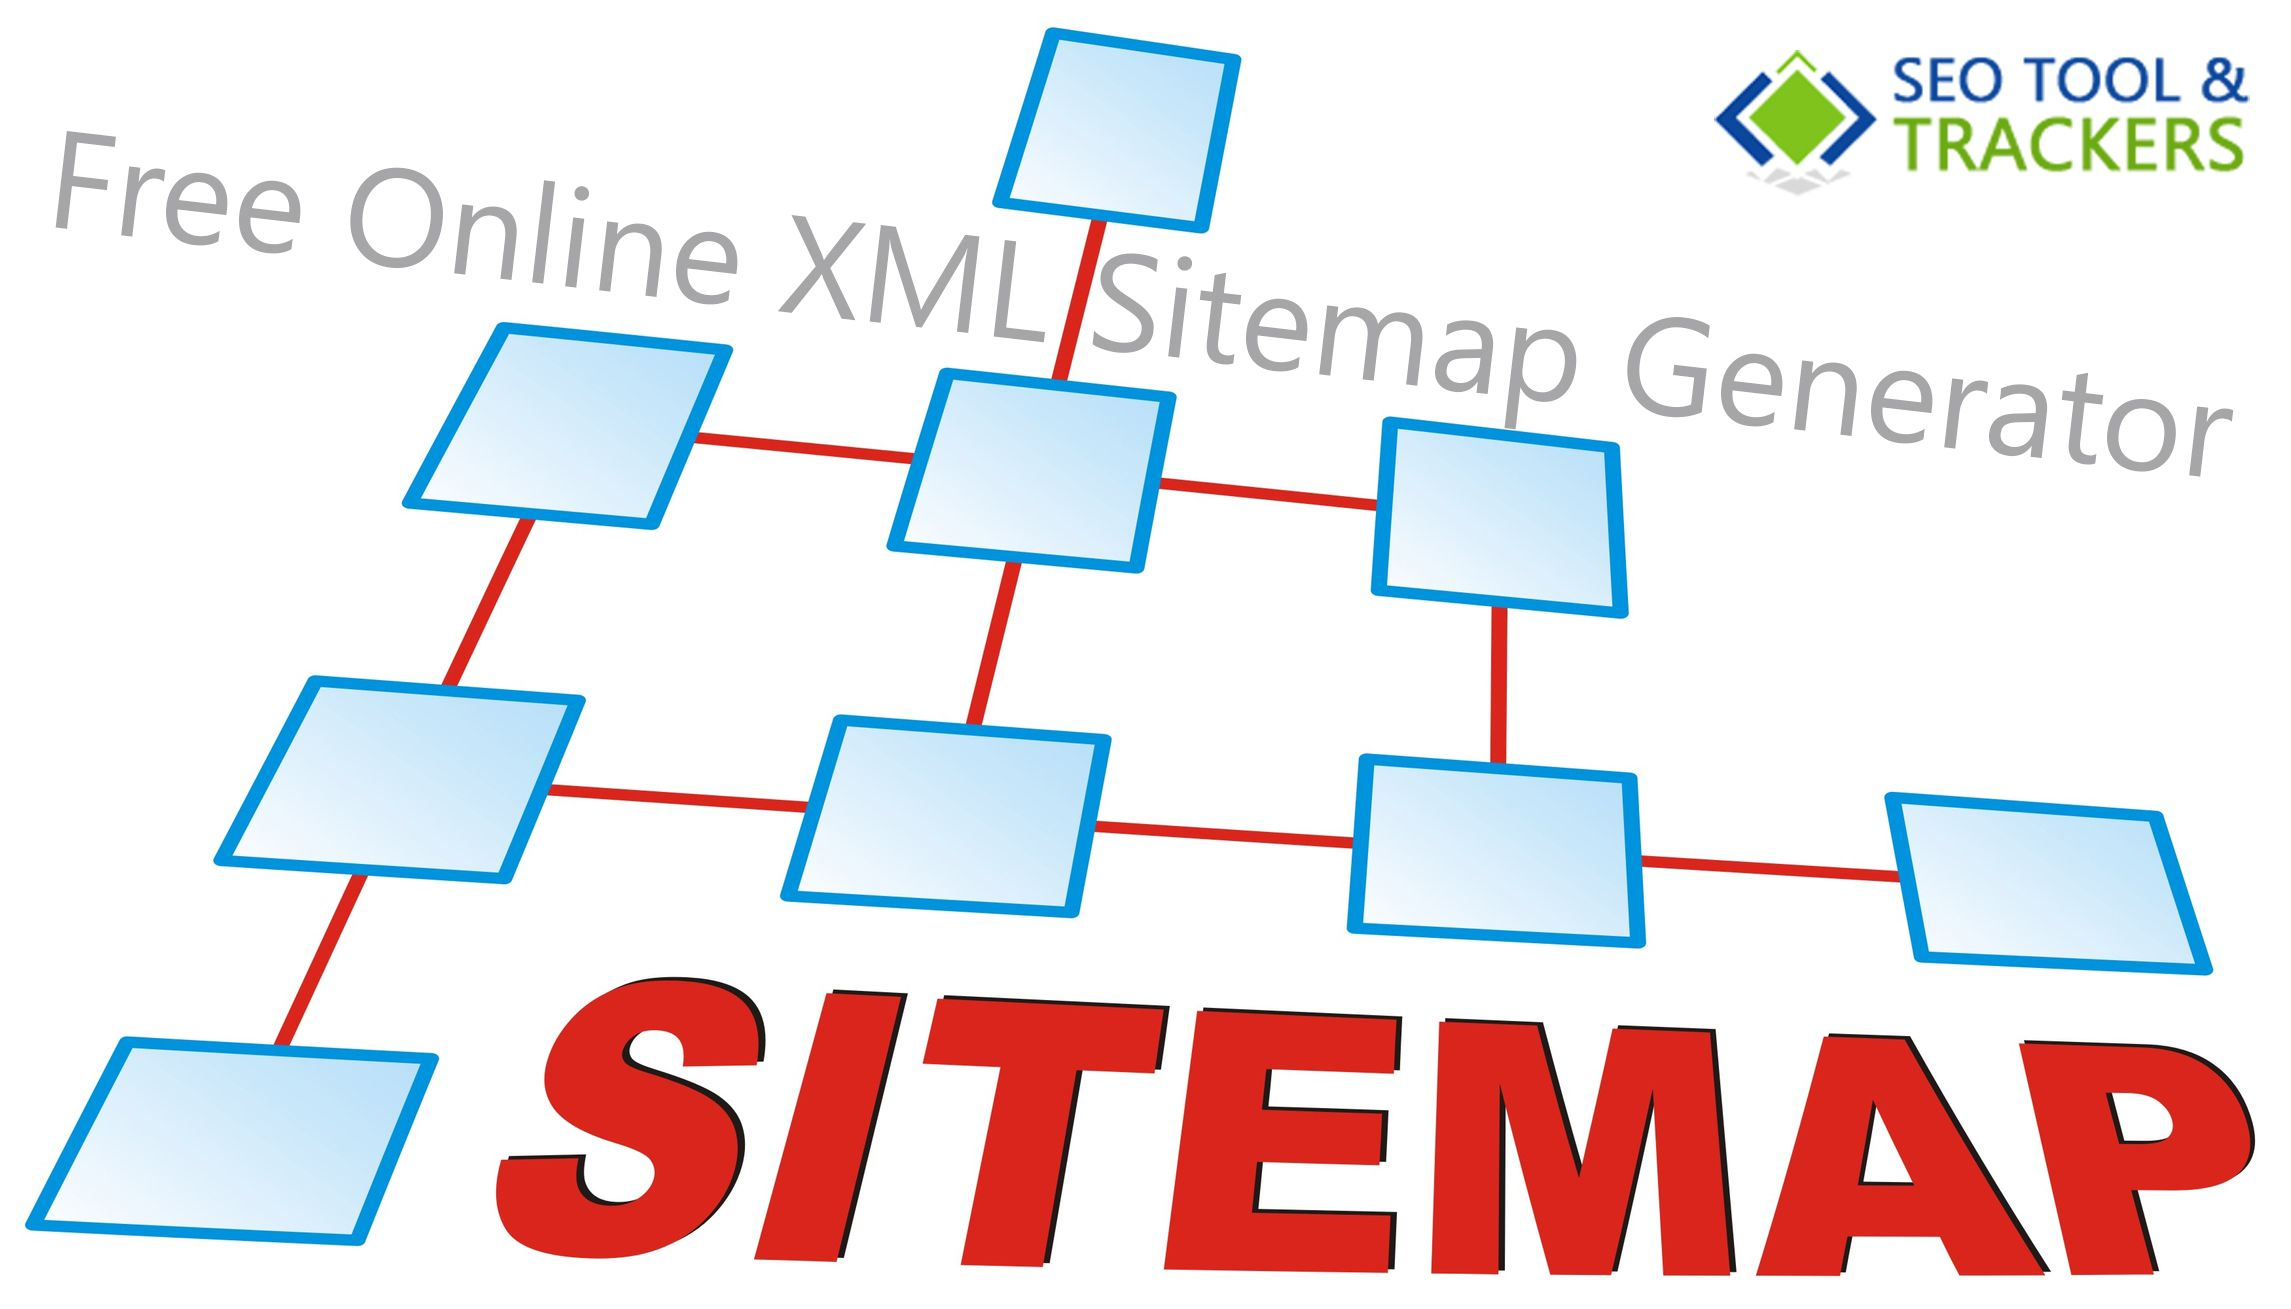 free online xml sitemap generator _ site map generator learn how to create s sitemap - Website Diagram Generator